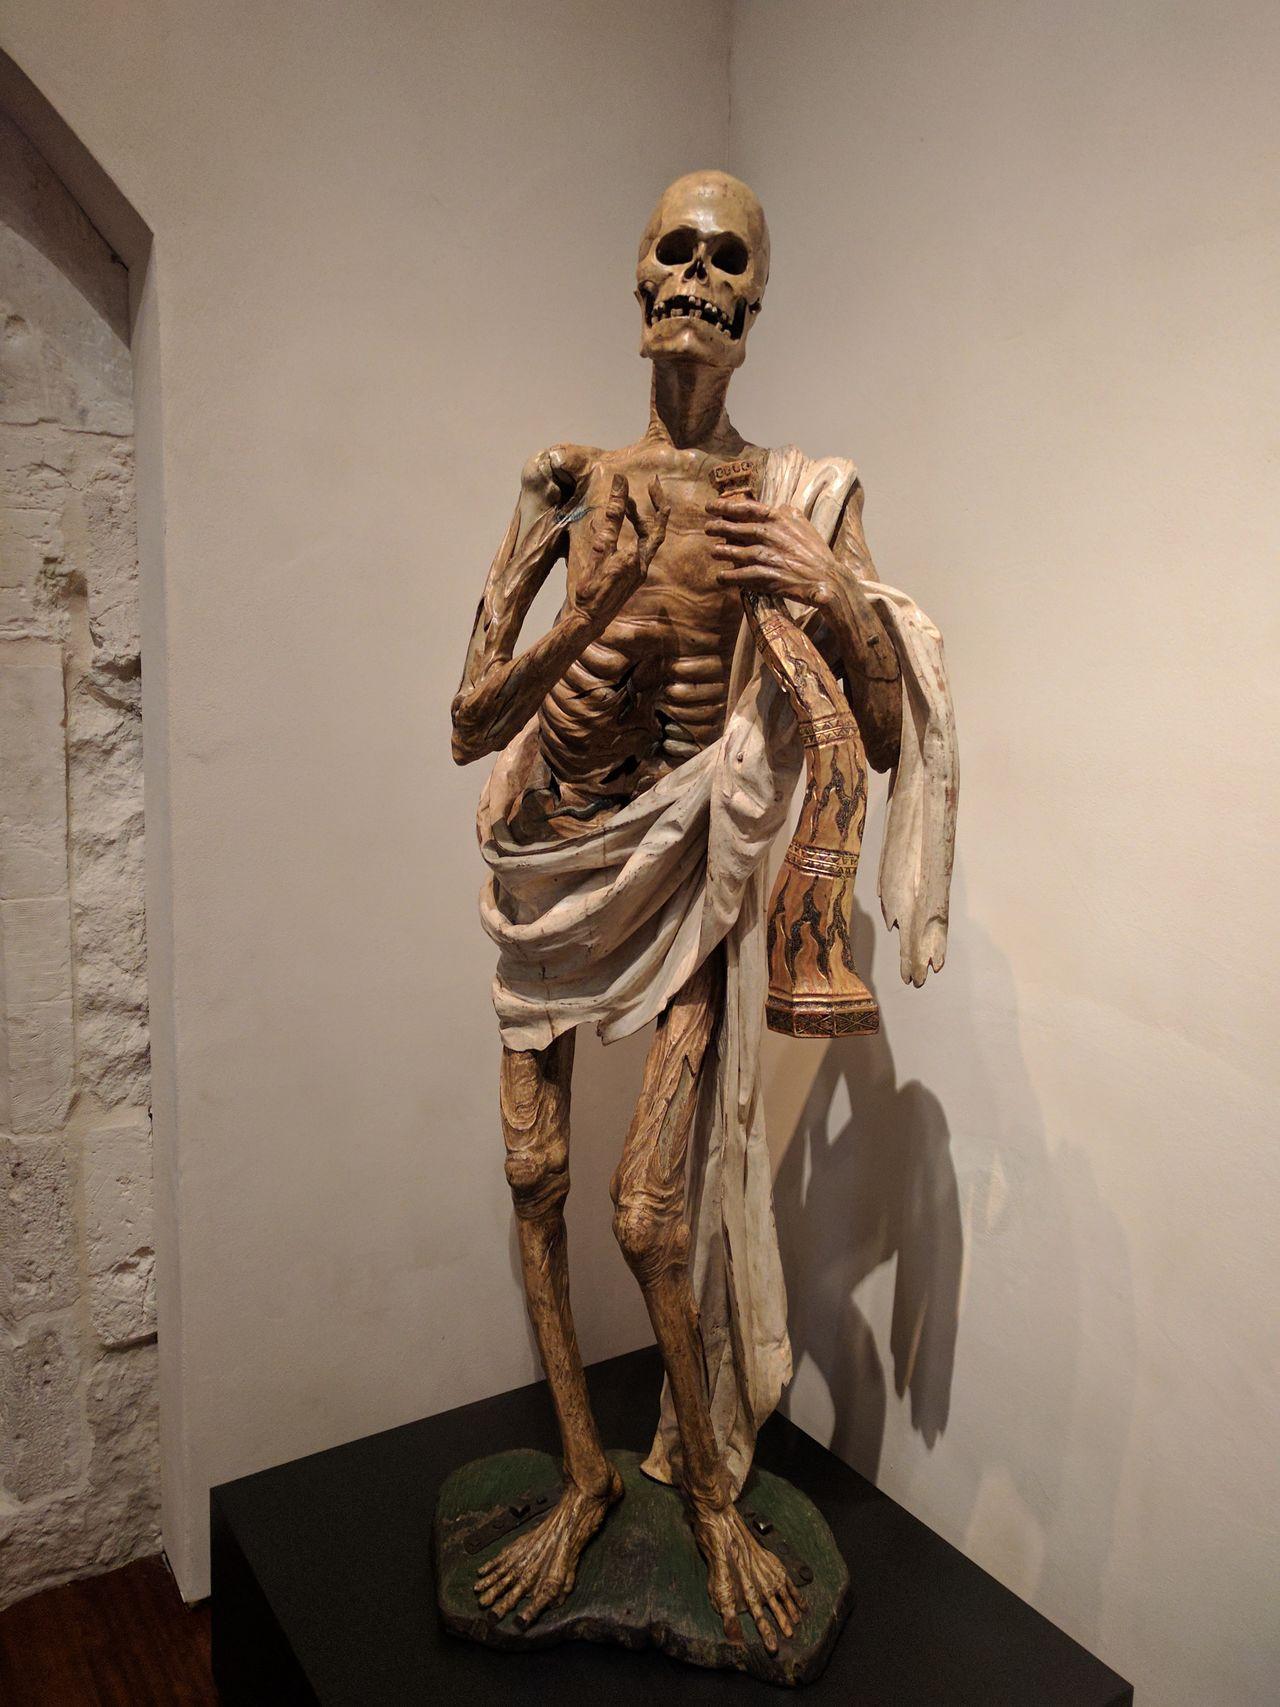 EyeEm Selects Muerte Death Museum Museo Nacional De Escultura Valladolid Low Angle View Escultura Statue EyeEm Best Shots EyeEm History